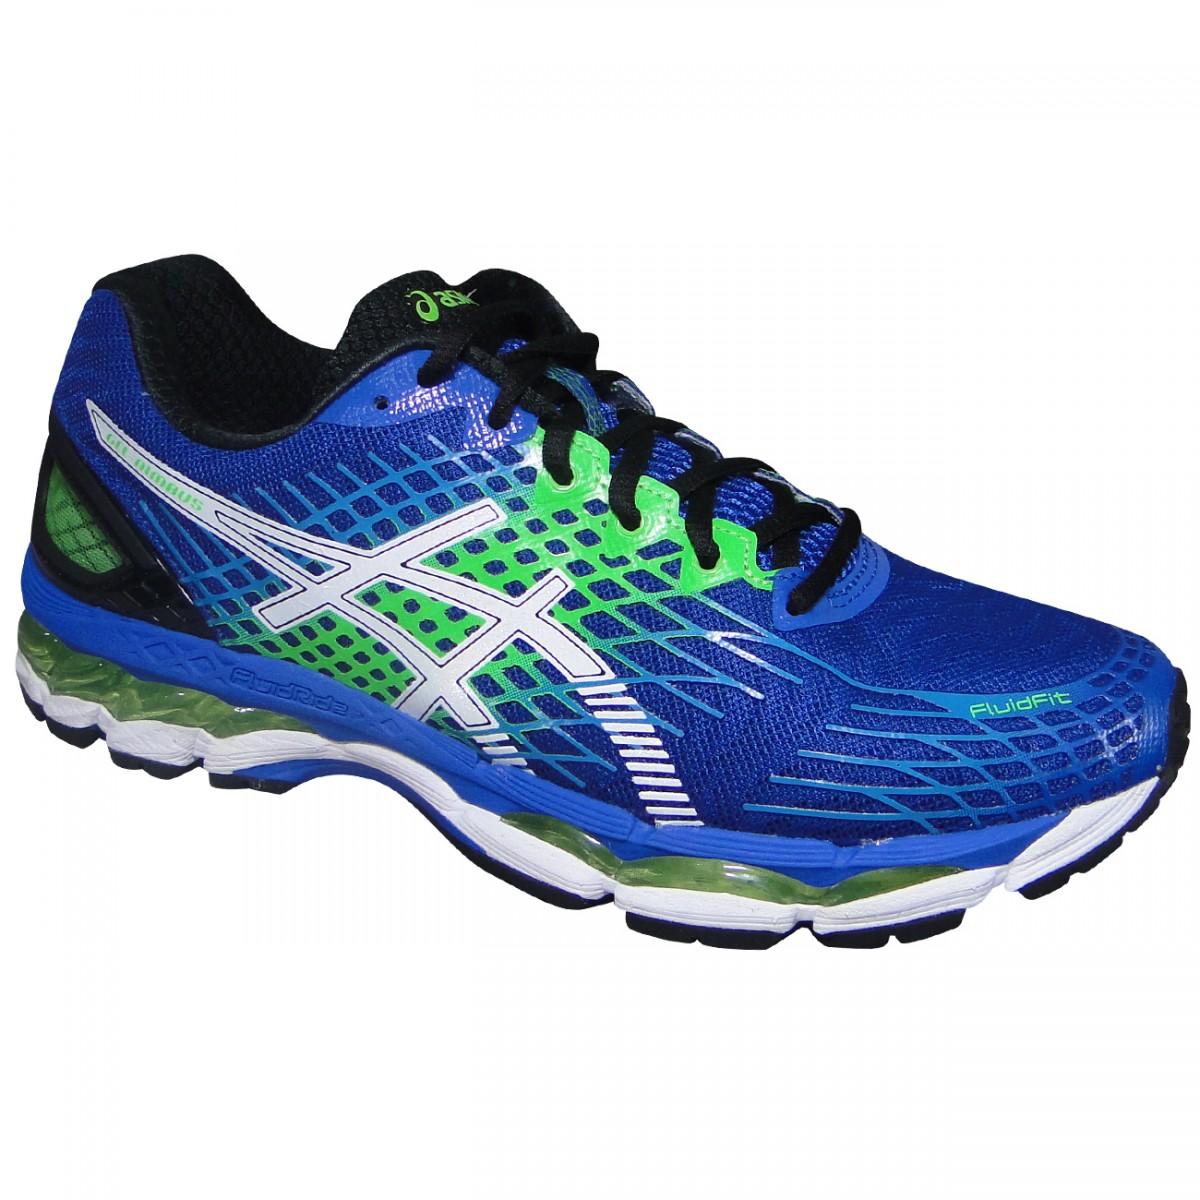 900fa905b4 Tenis Asics Gel-Nimbus 17 T507N 5901 - Azul Branco Verde - Chuteira Nike